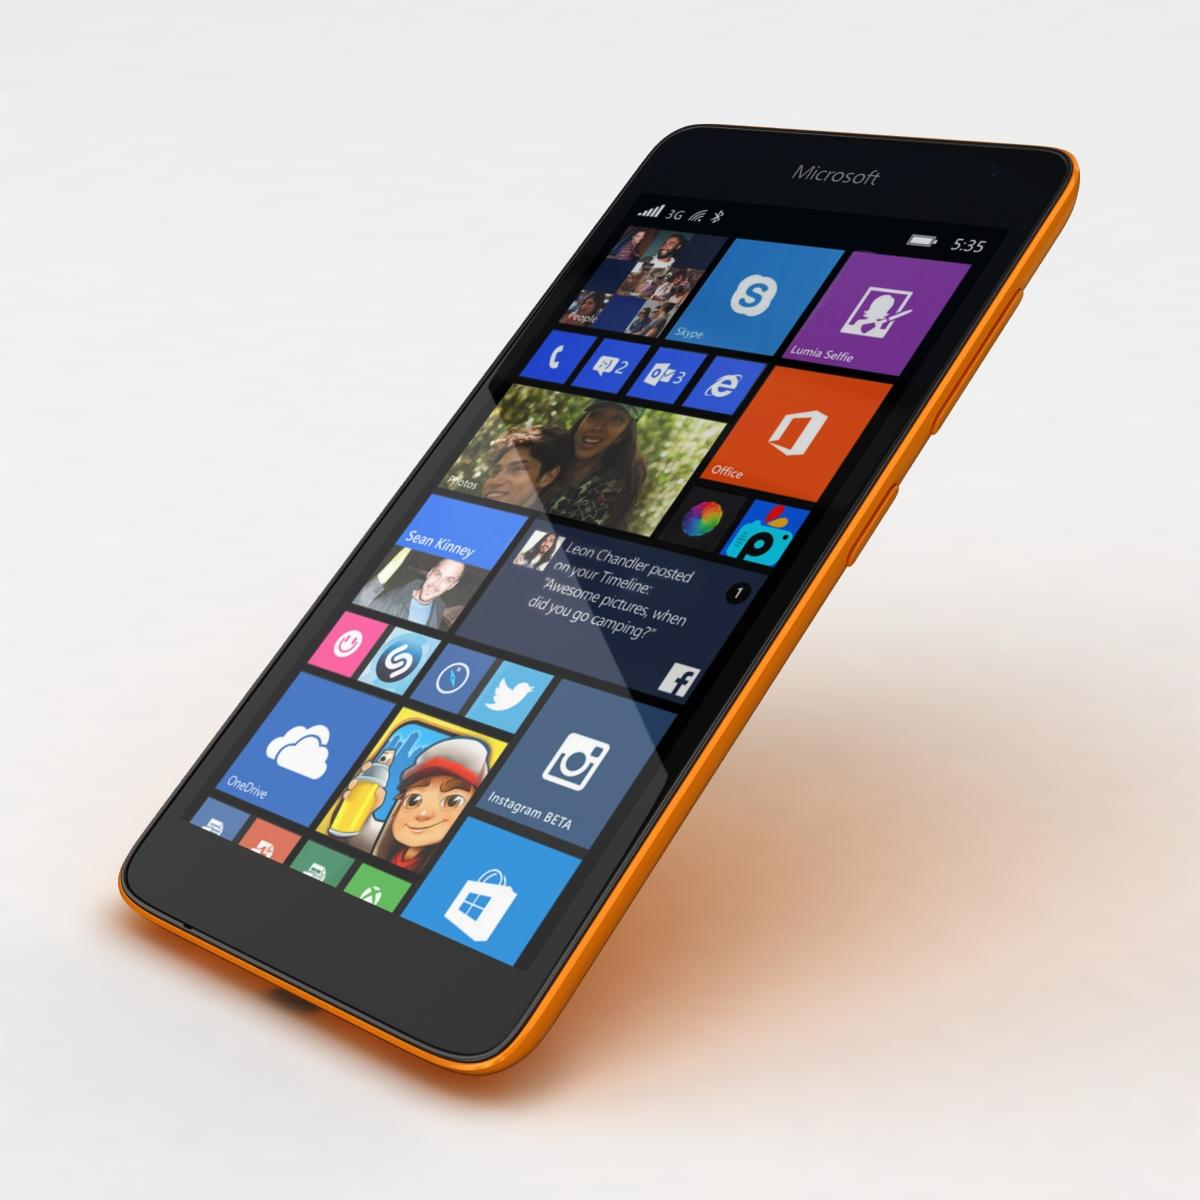 microsoft lumia 535 and dual sim orange 3d model 3ds max fbx c4d obj 204121